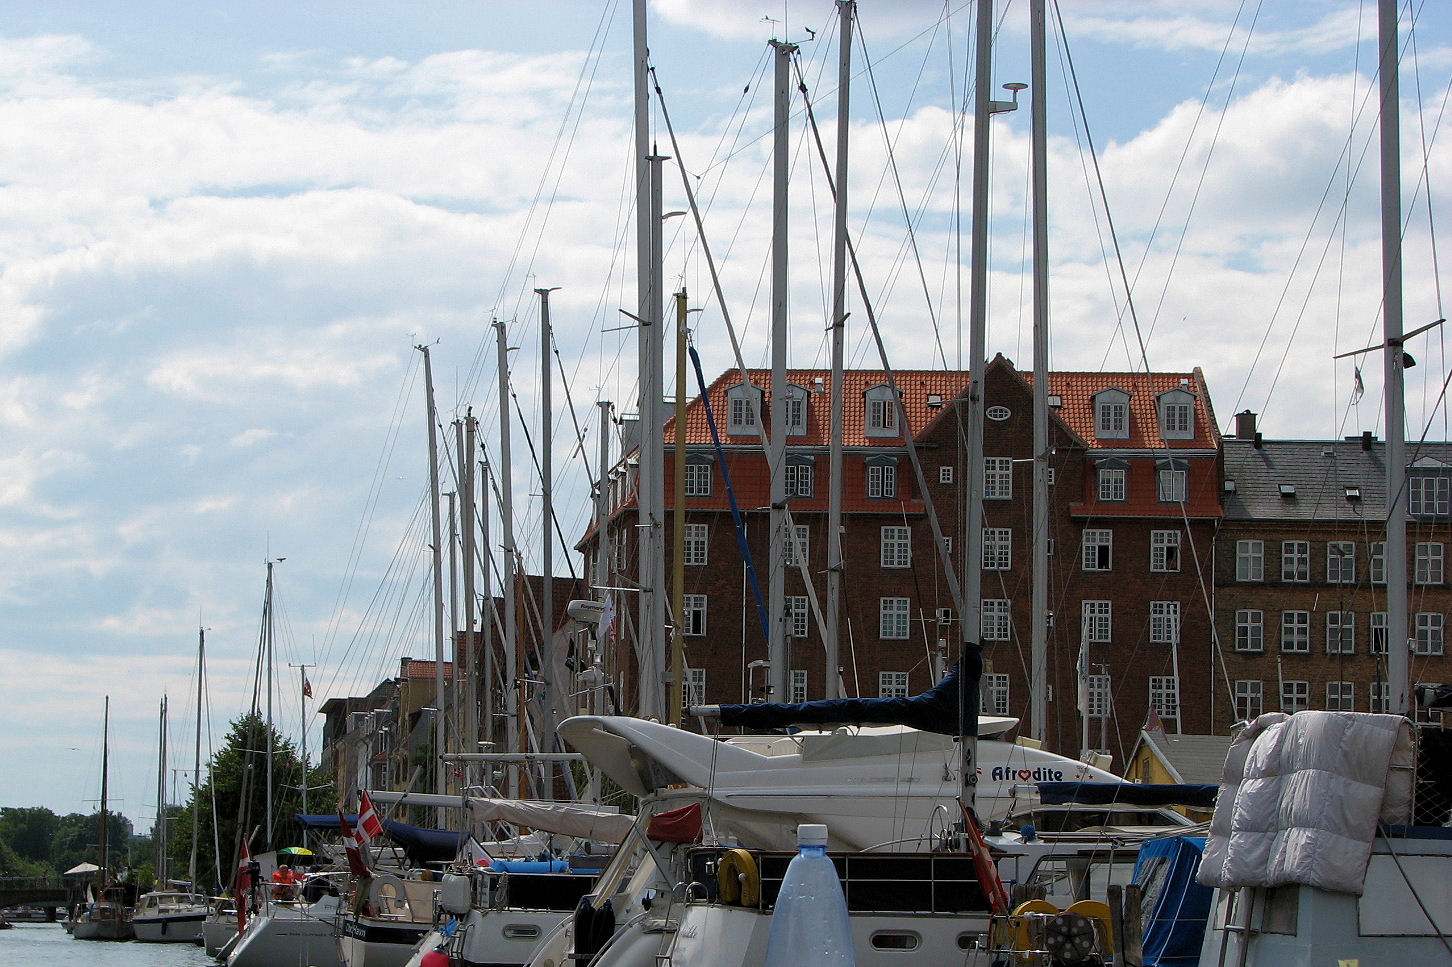 Boats, Buildings, Clouds in Copenhagen